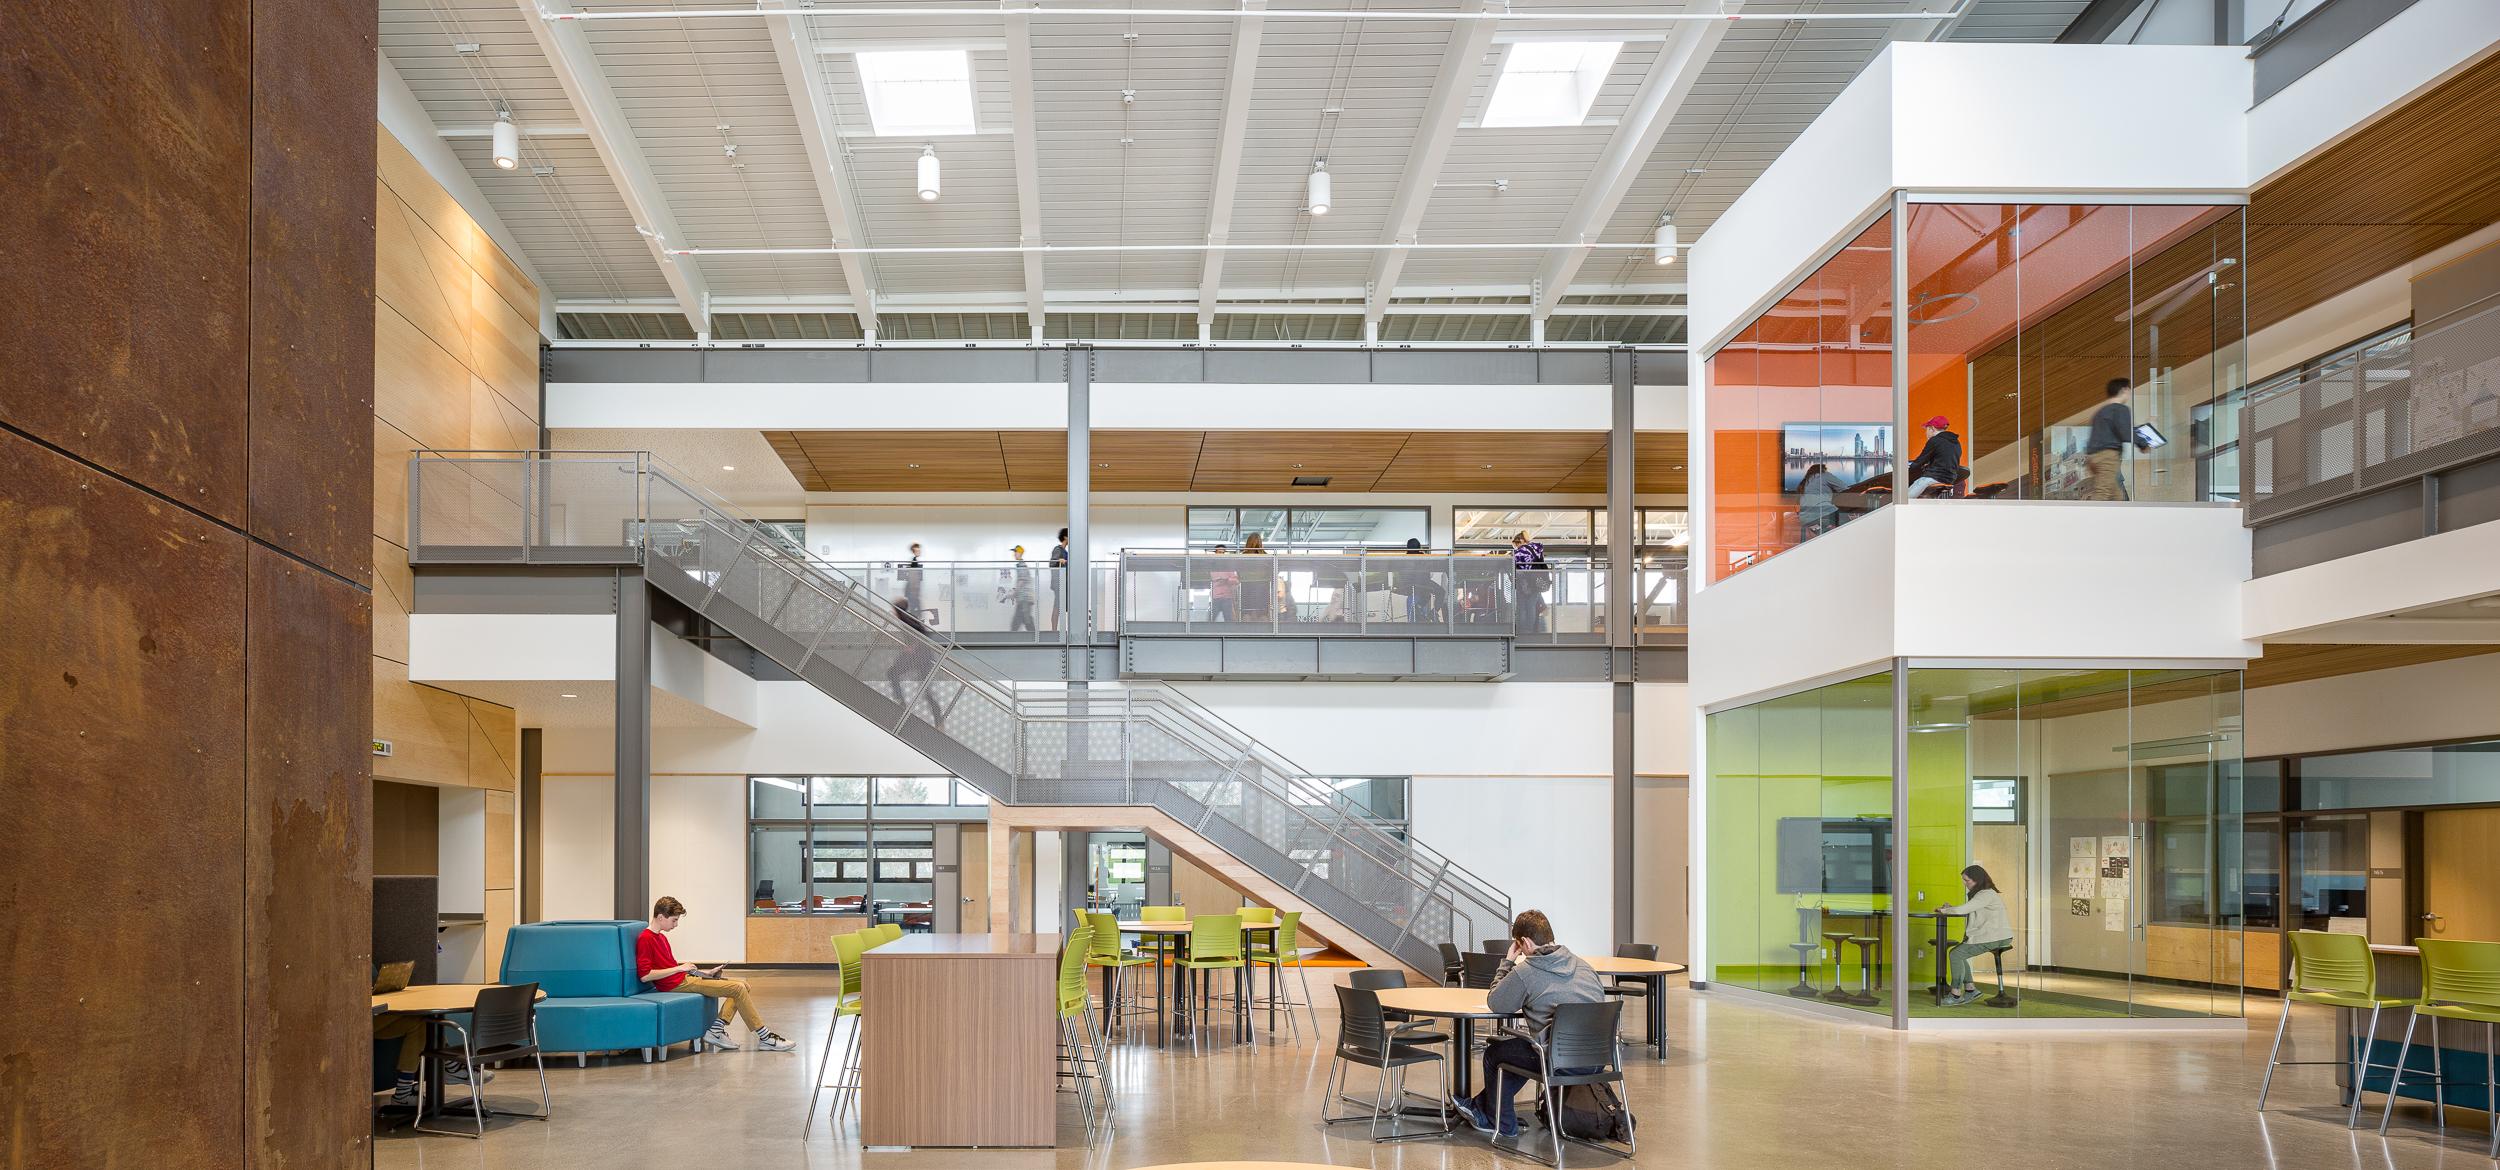 Camas Discovery High School / DLR Group